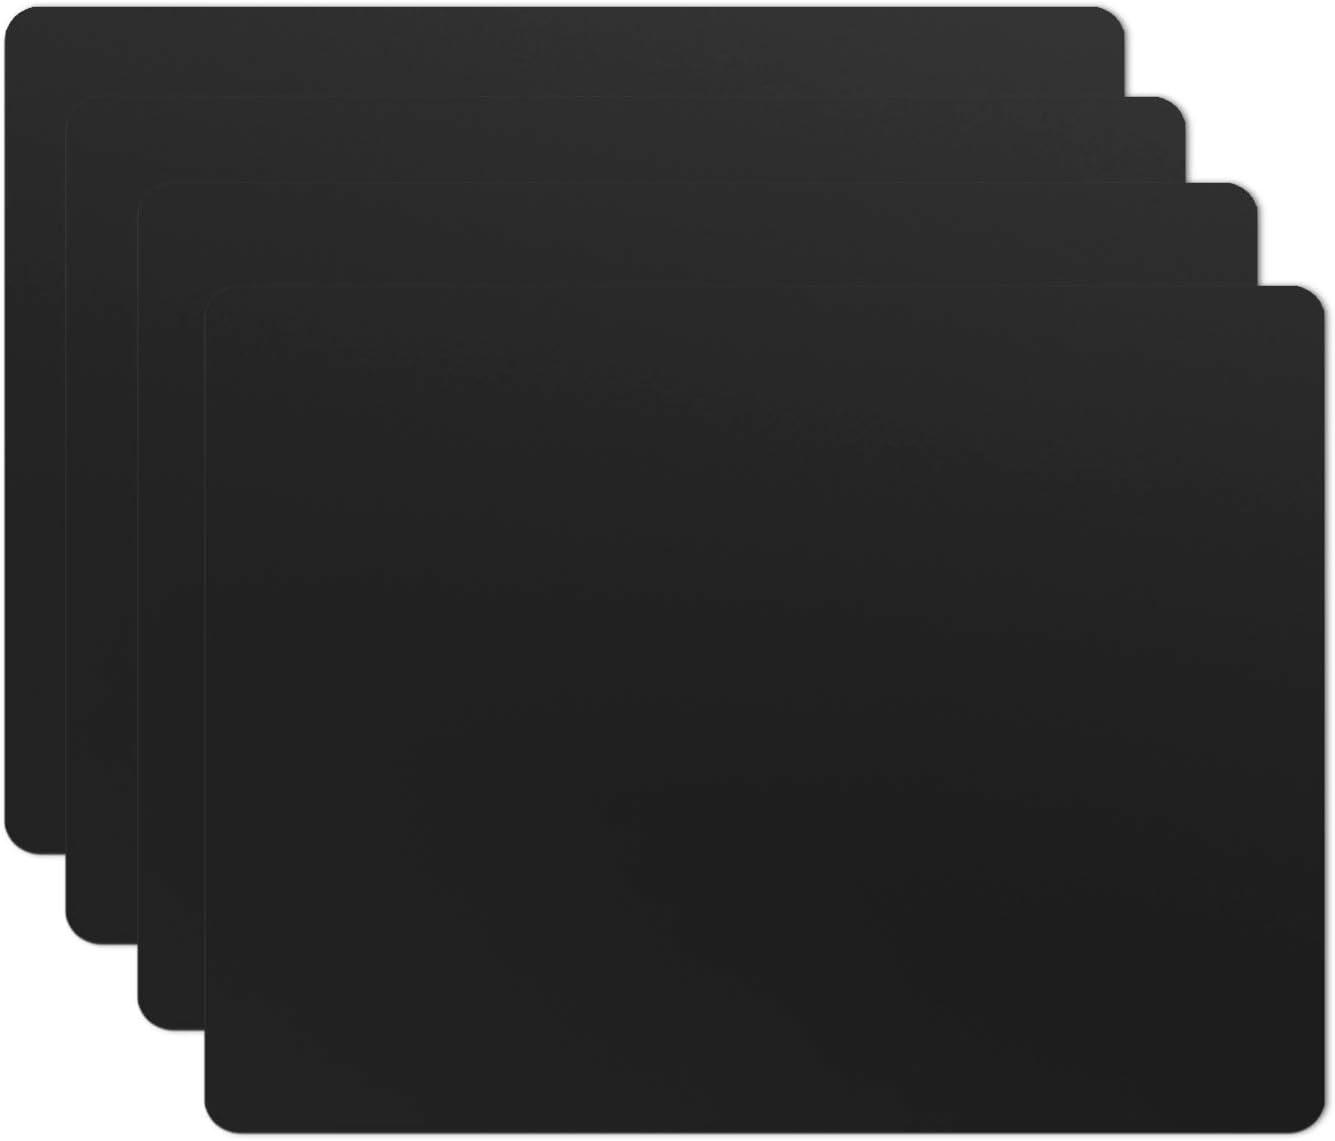 SiliconePlacemats,Food-GradeNon-SlipWaterproof,Dining,StainResistant,CountertopProtector,KitchenCounterMat,HeatResistant,Bakingmat DishwasherSafe (15.7x11.8Inch-4pack, Black)